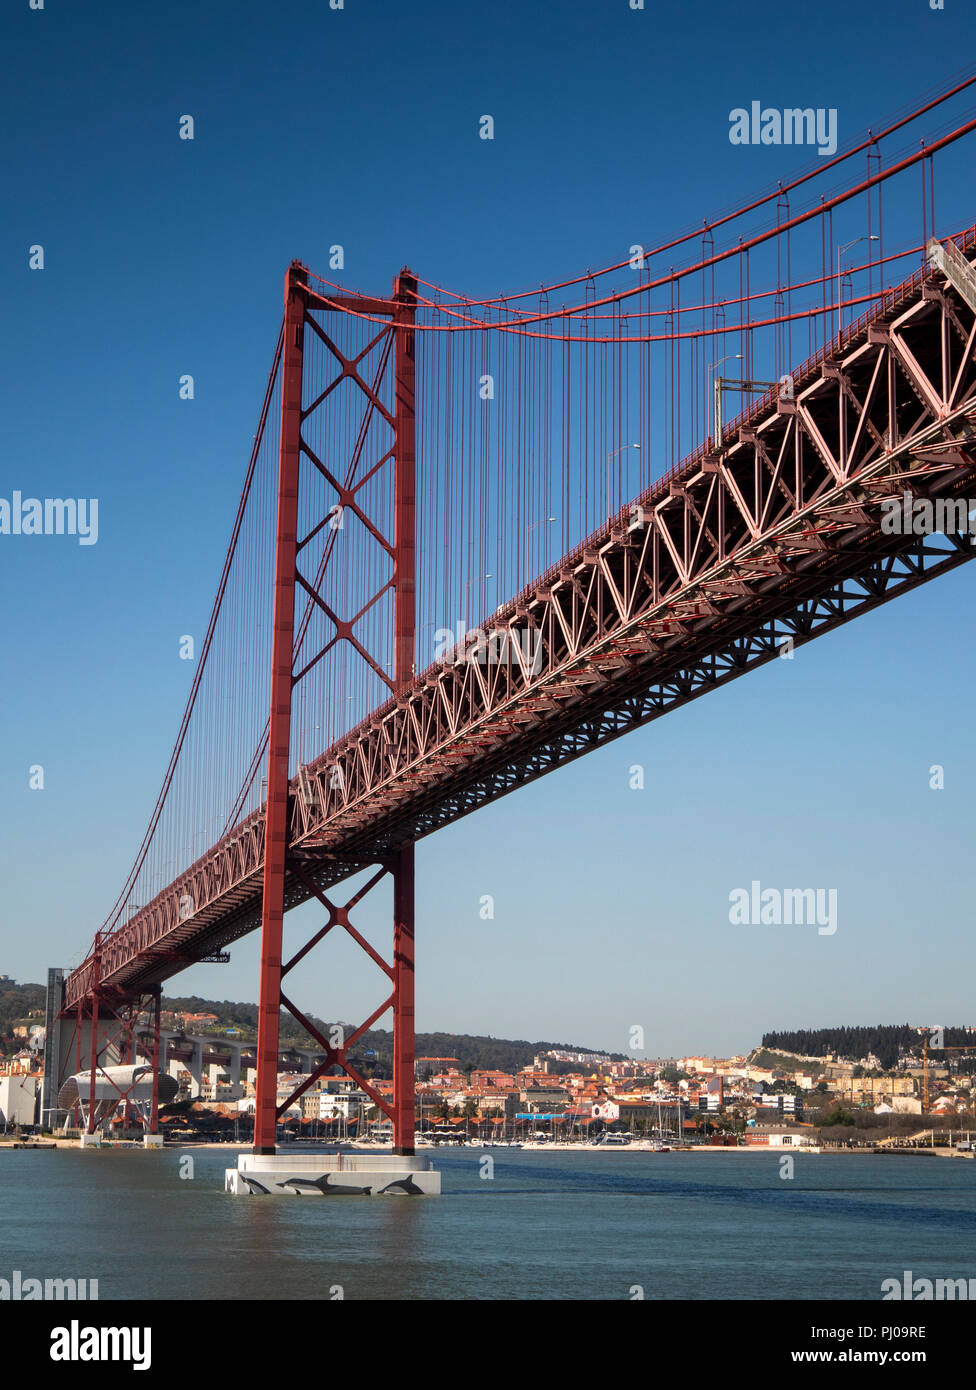 Portugal, Lisbon, ponte 25 de Abril, (25th April Bridge) over Tagus River, panoramic Stock Photo